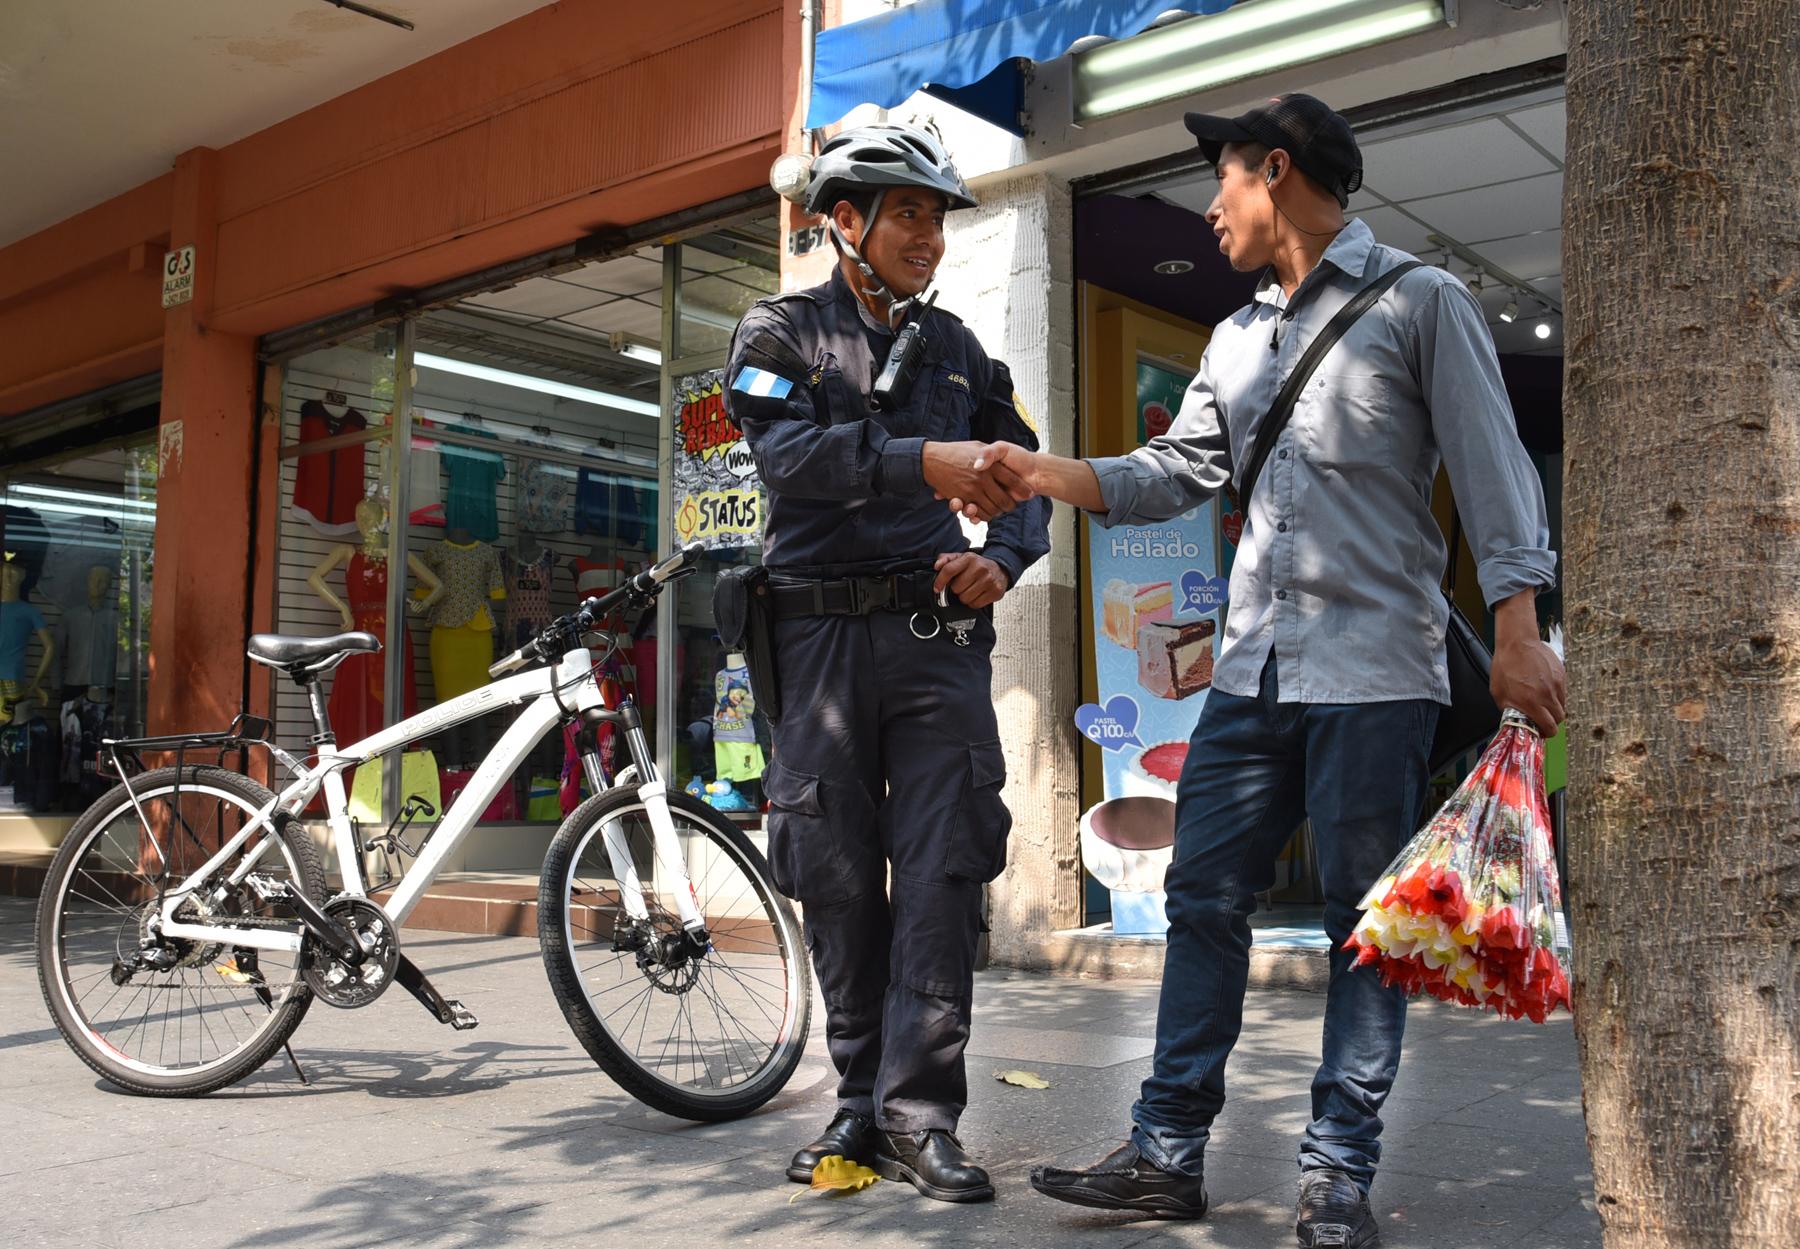 Police officer standing near bike and shaking man's hand (U.S. Embassy Guatemala)